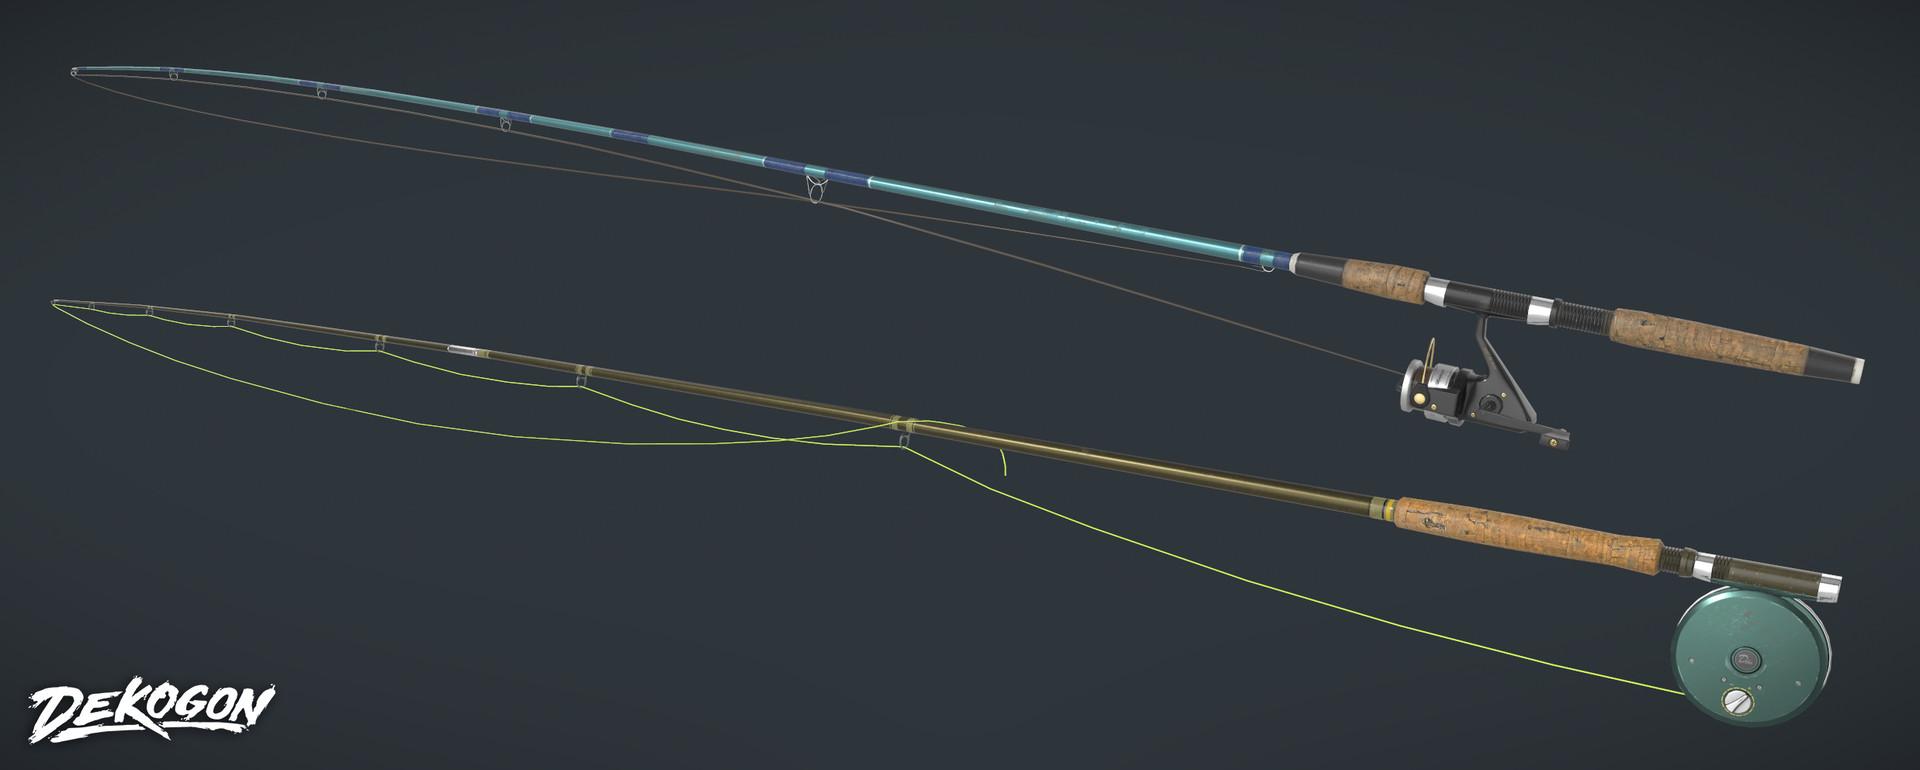 Andy nelson fishingpole lengthrender